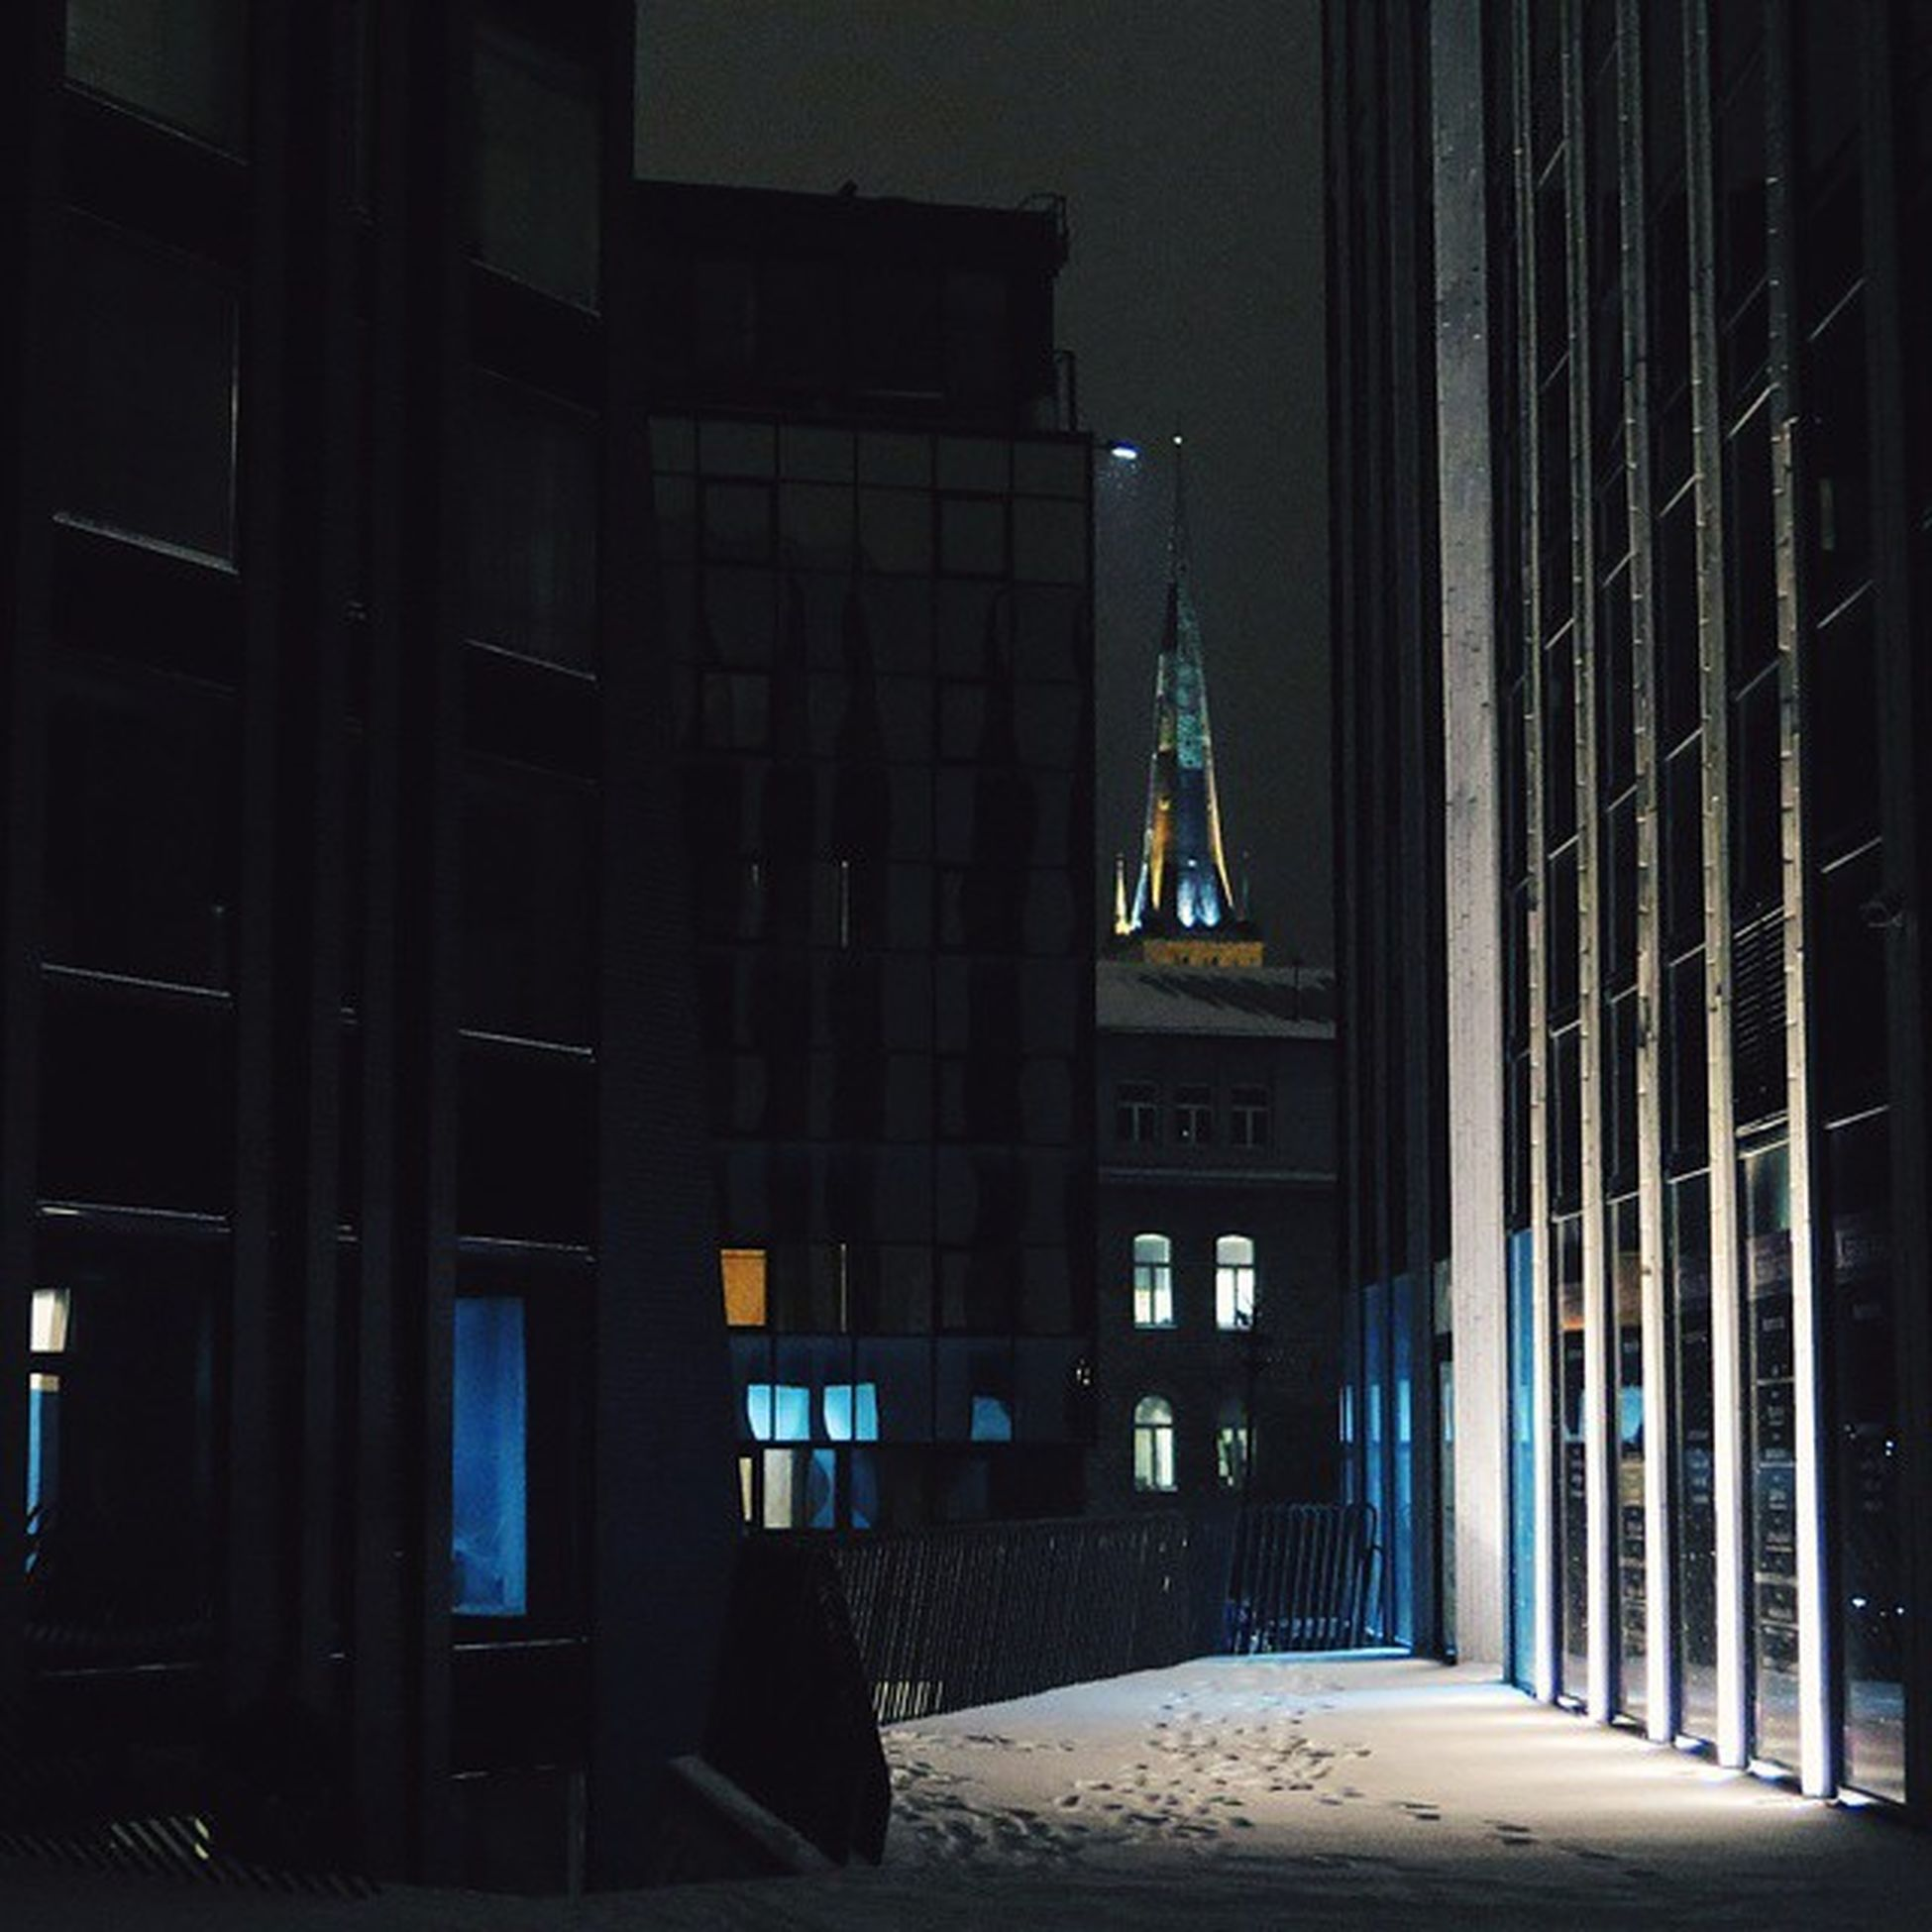 Tallinn Estonia Europe Visittallinn vscotallinn vsco vscocam vscoeurope vscotravel travel Doyoutravel exploremore squarepic vscobest vscoaward vscoartist vscomoment vsco_hub vscotop vscogood vscorussia vscofilm snow winter